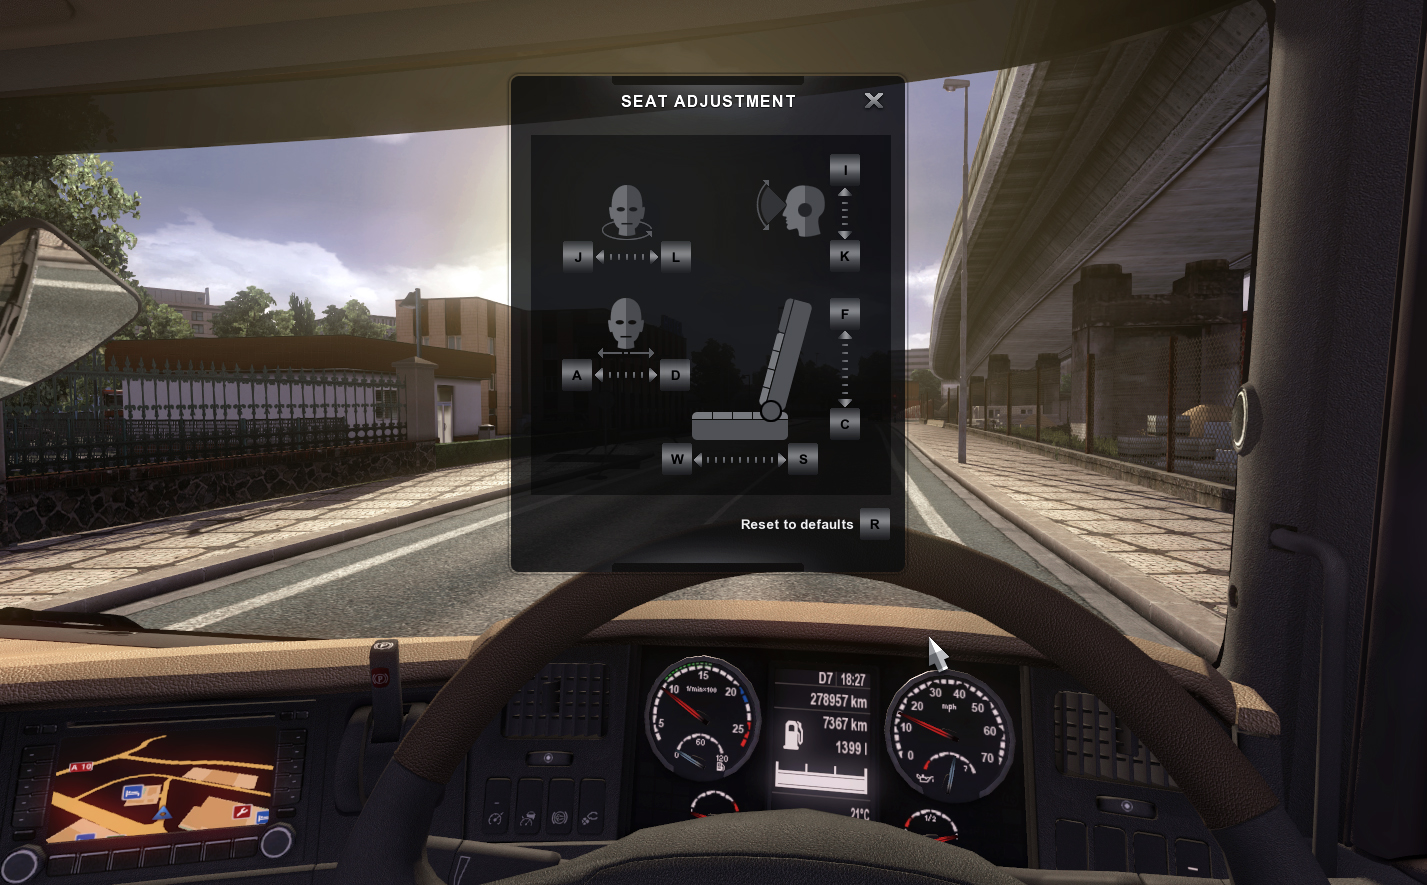 Euro Truck Sim 2 June 2014 seat adjustment UI